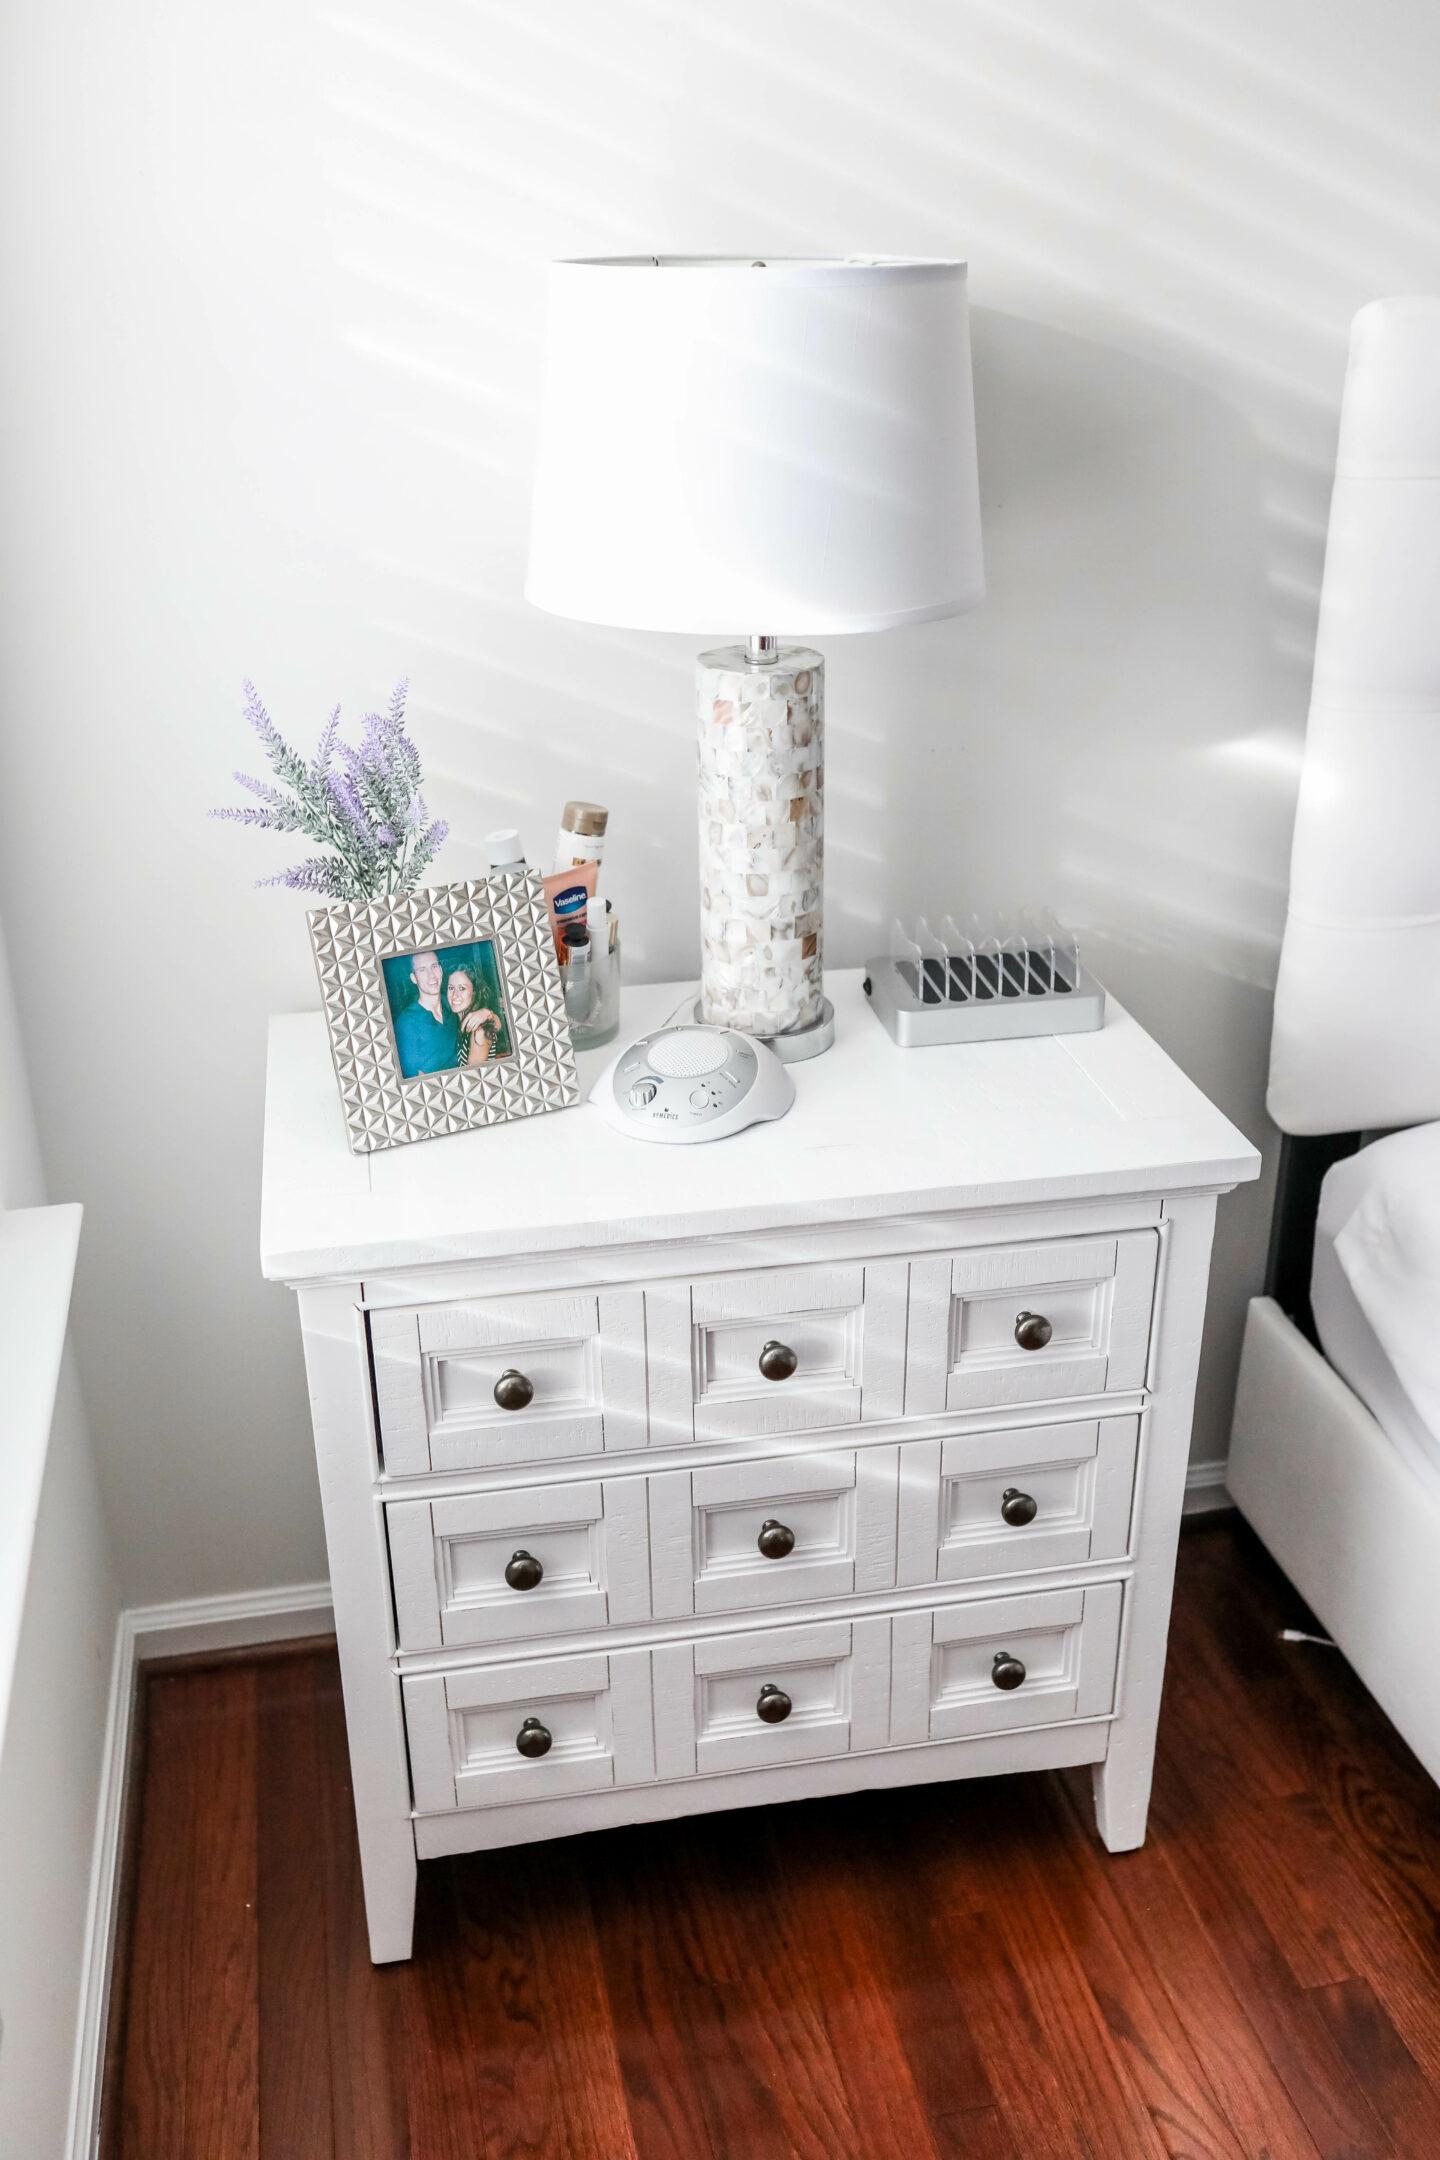 White master bedroom set nightstand - Raymour & Flanigan nightstand